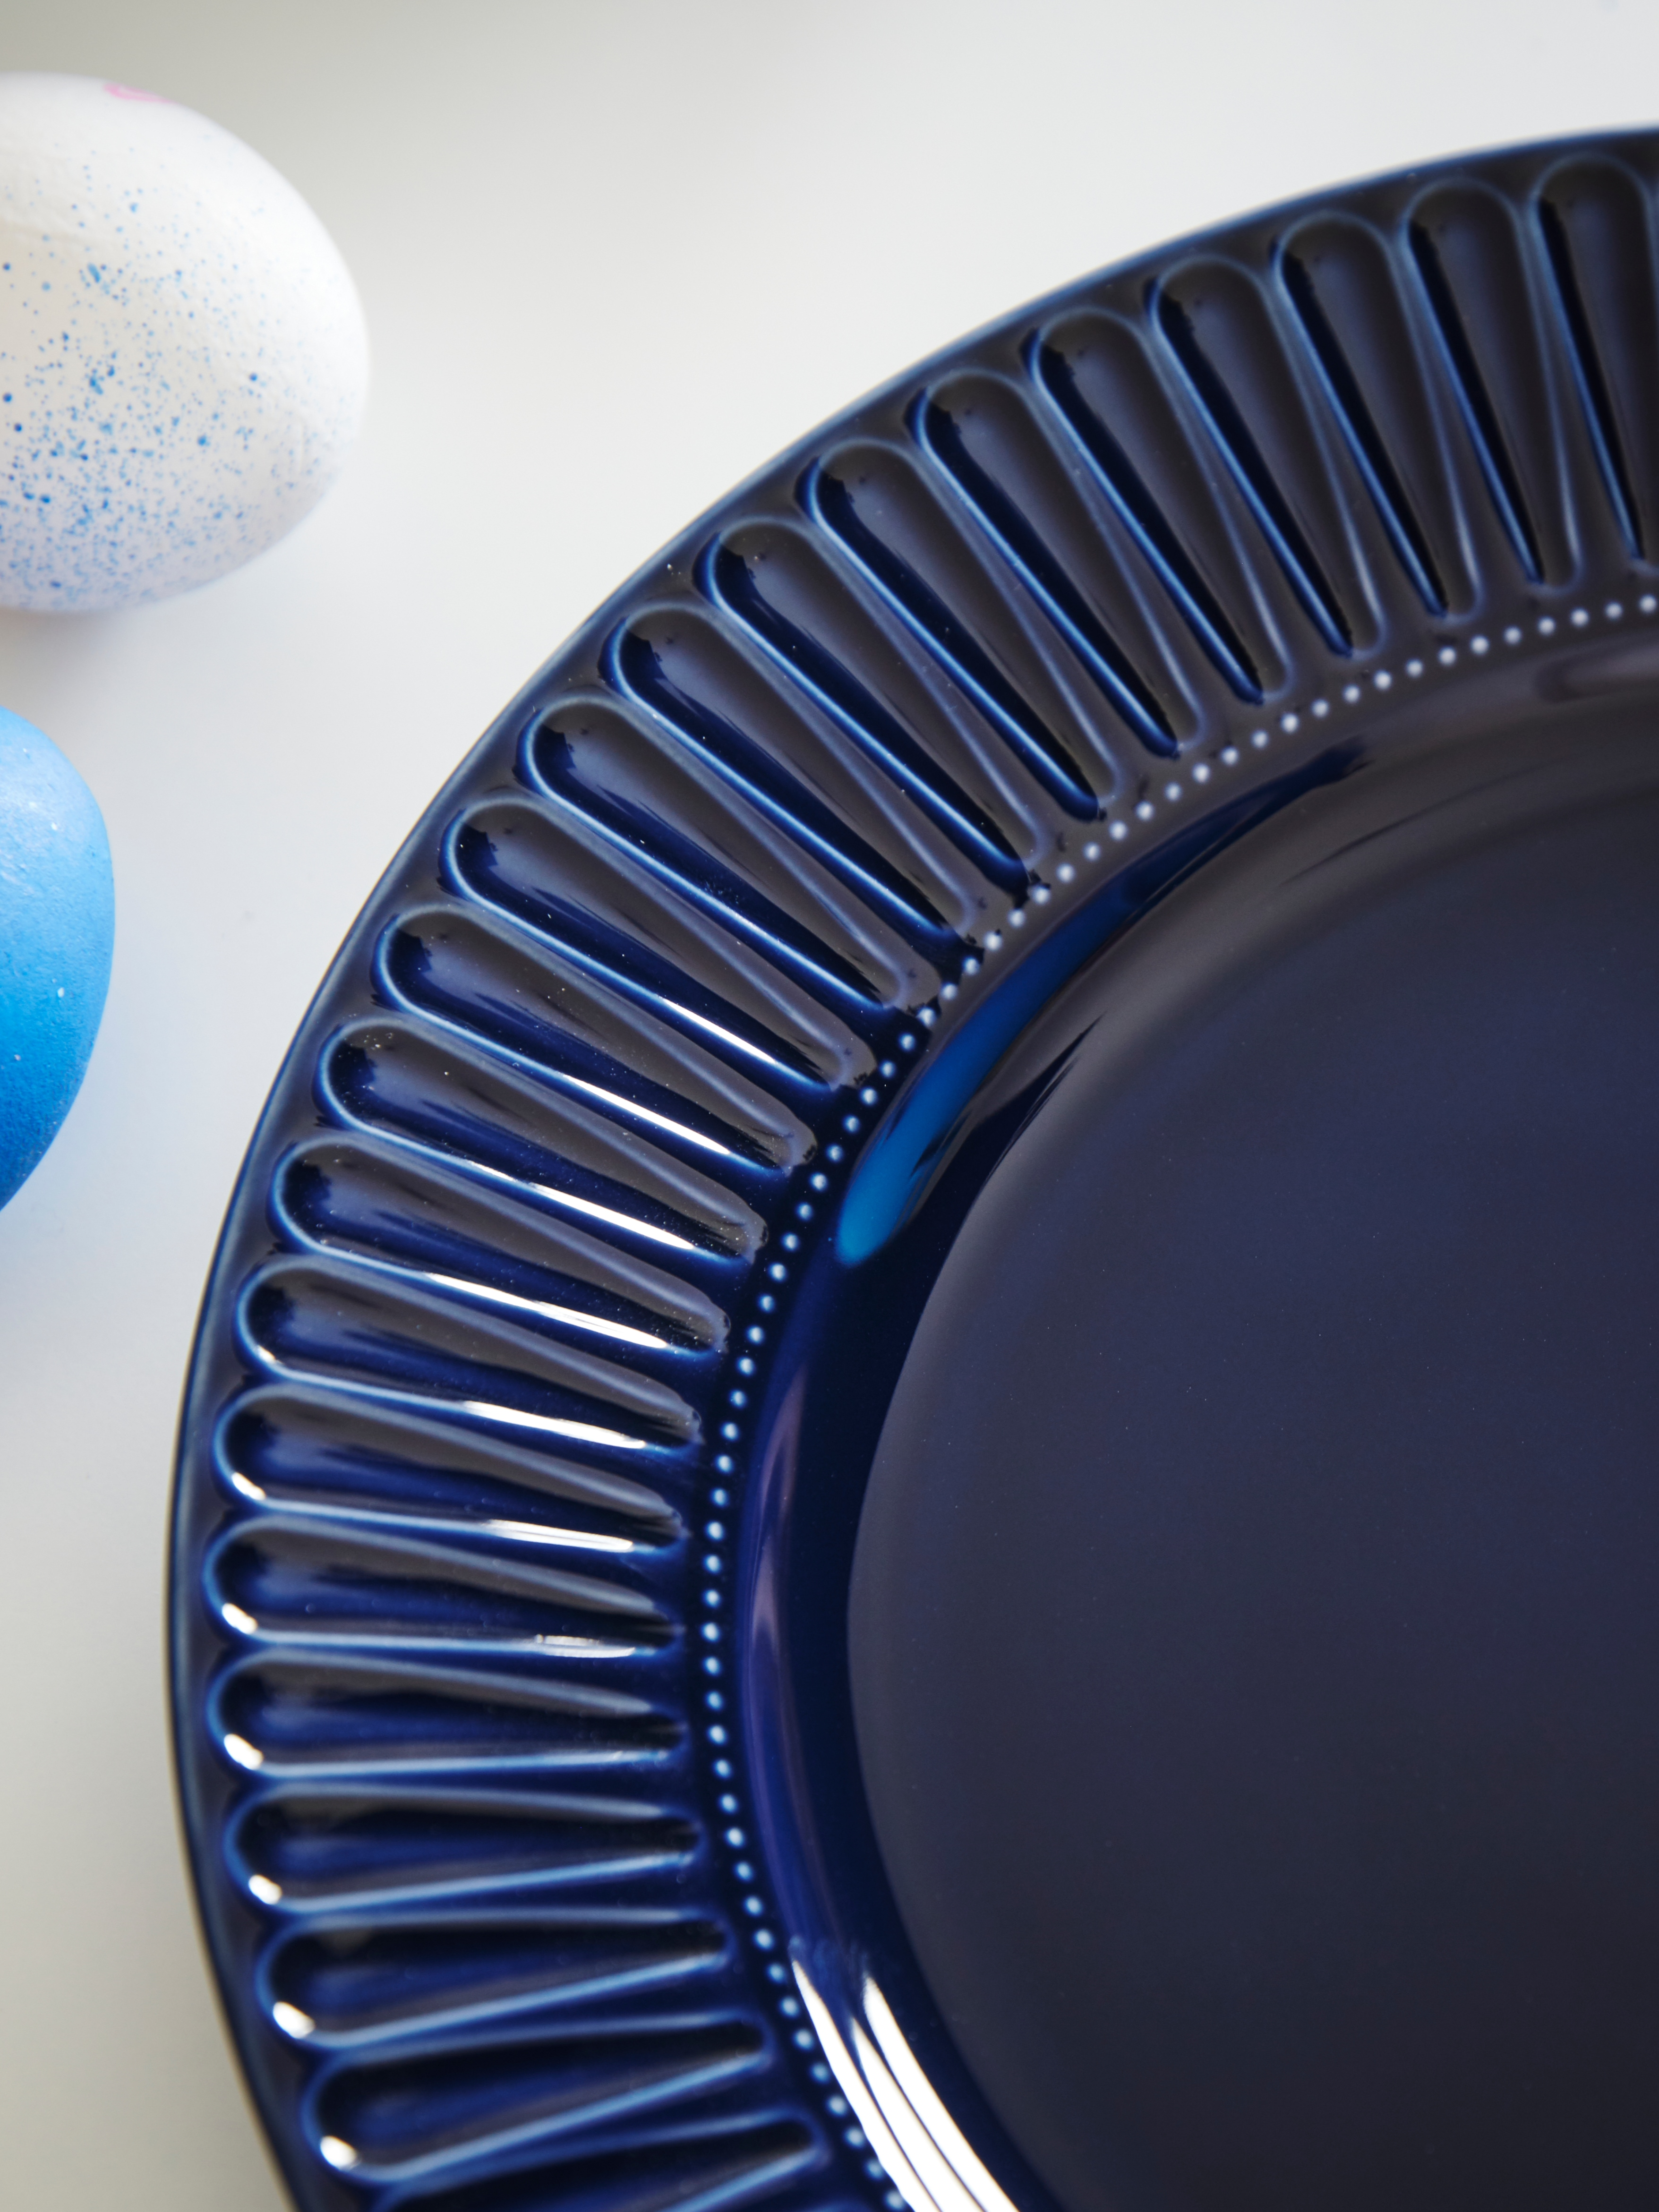 Krupni plan fasetiranog tamnoplavog porculanskog STRIMMIG tanjura pokraj dva pjegava plava jaja.